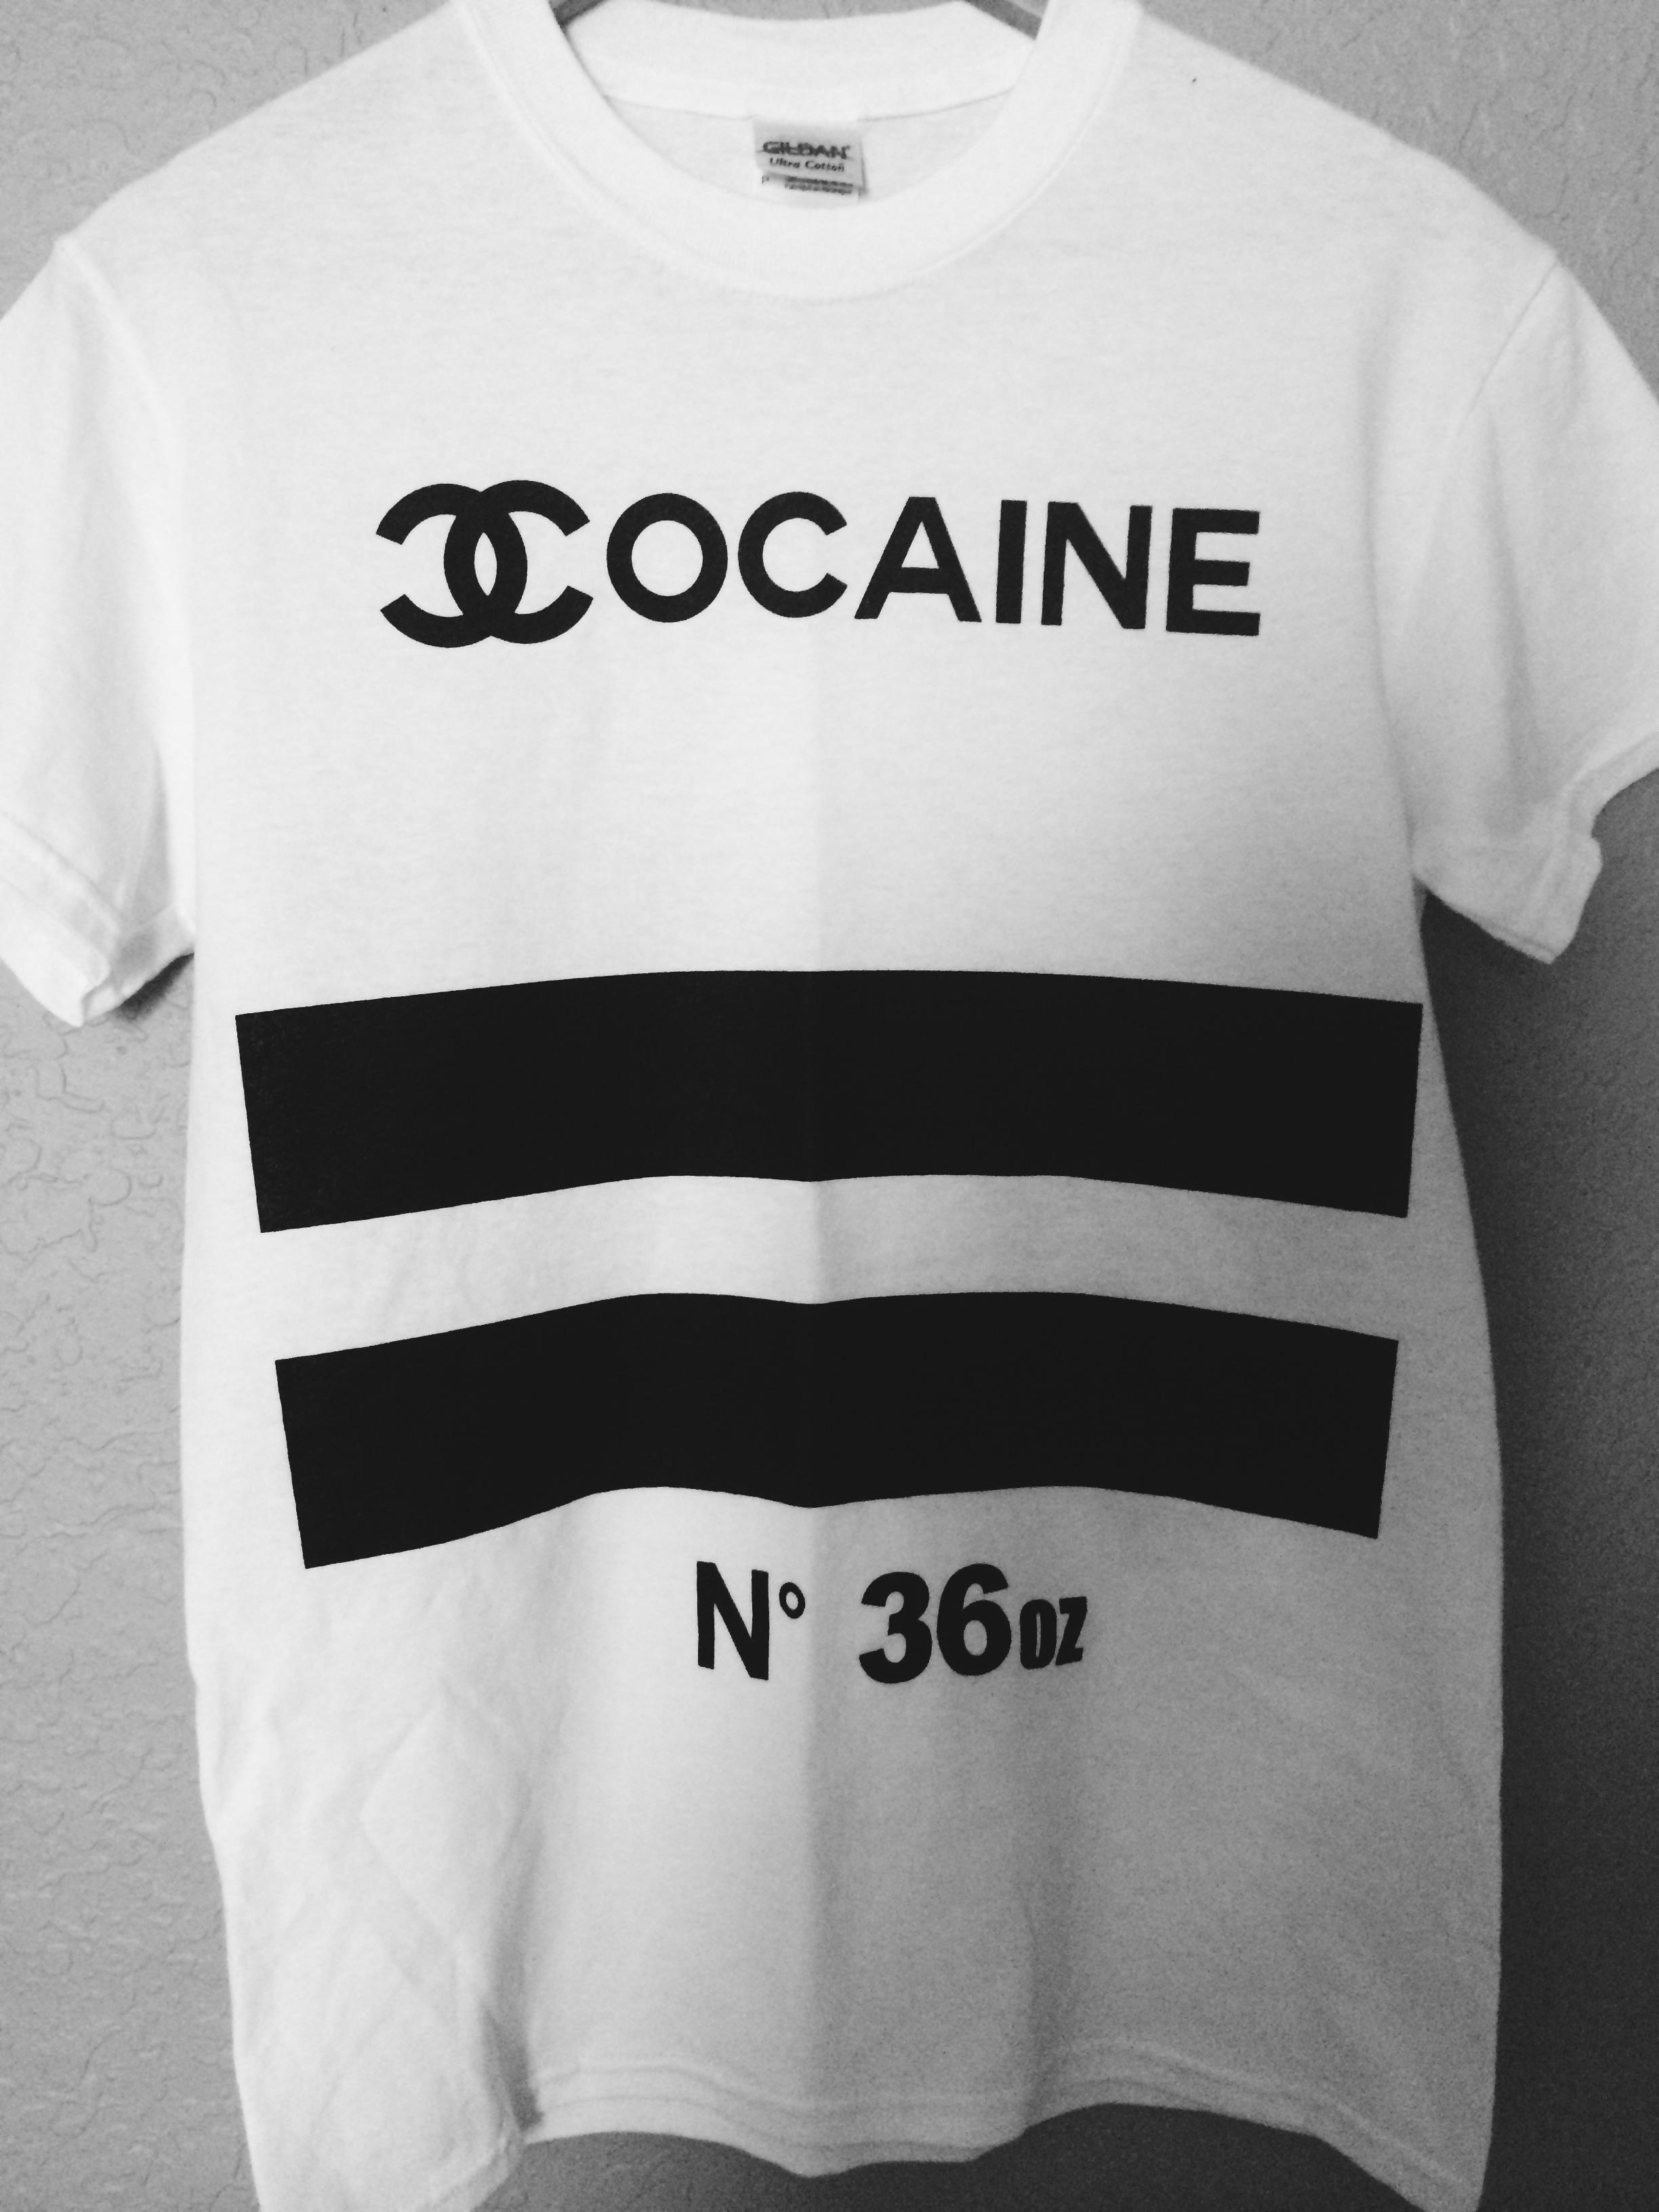 Cocaine Chanel Tee (White)